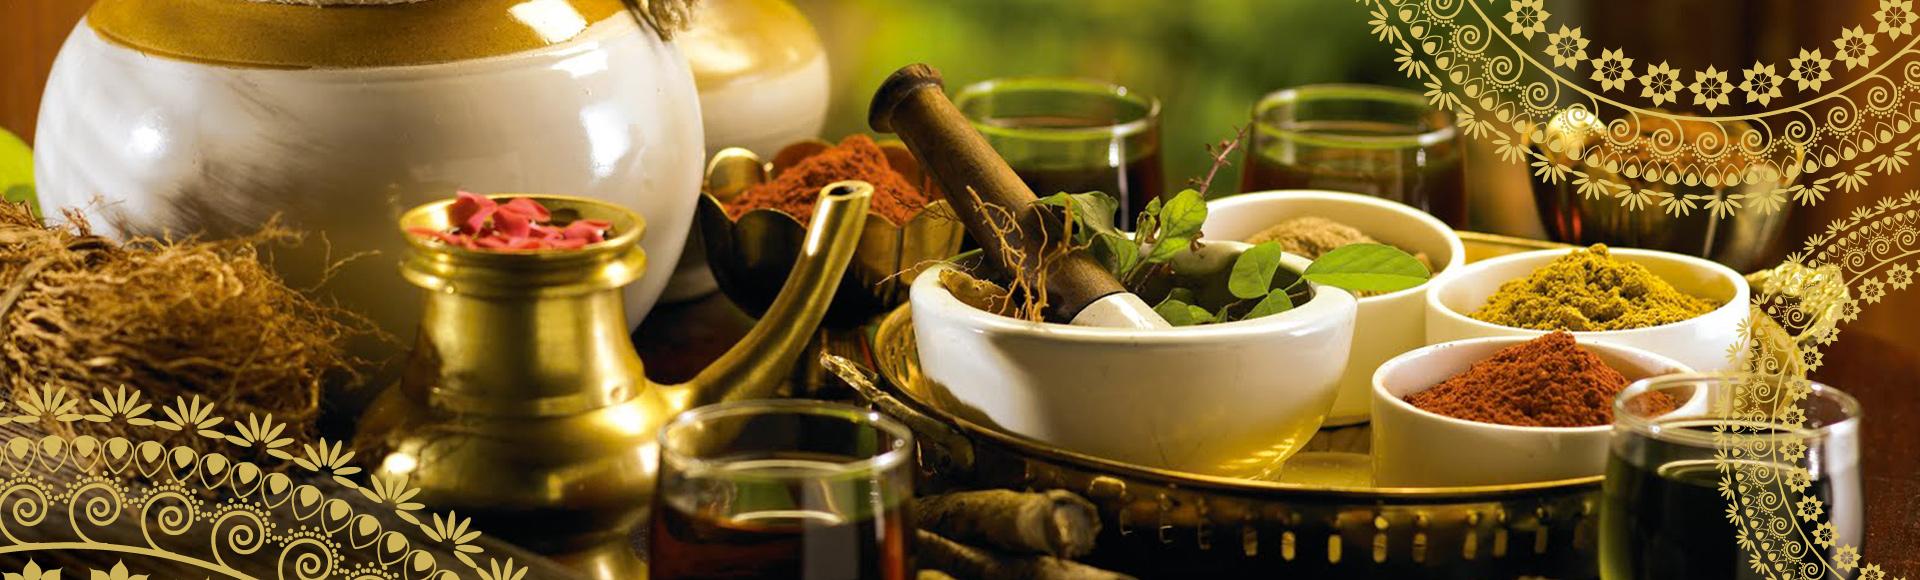 Cucina indiana e vegetariana